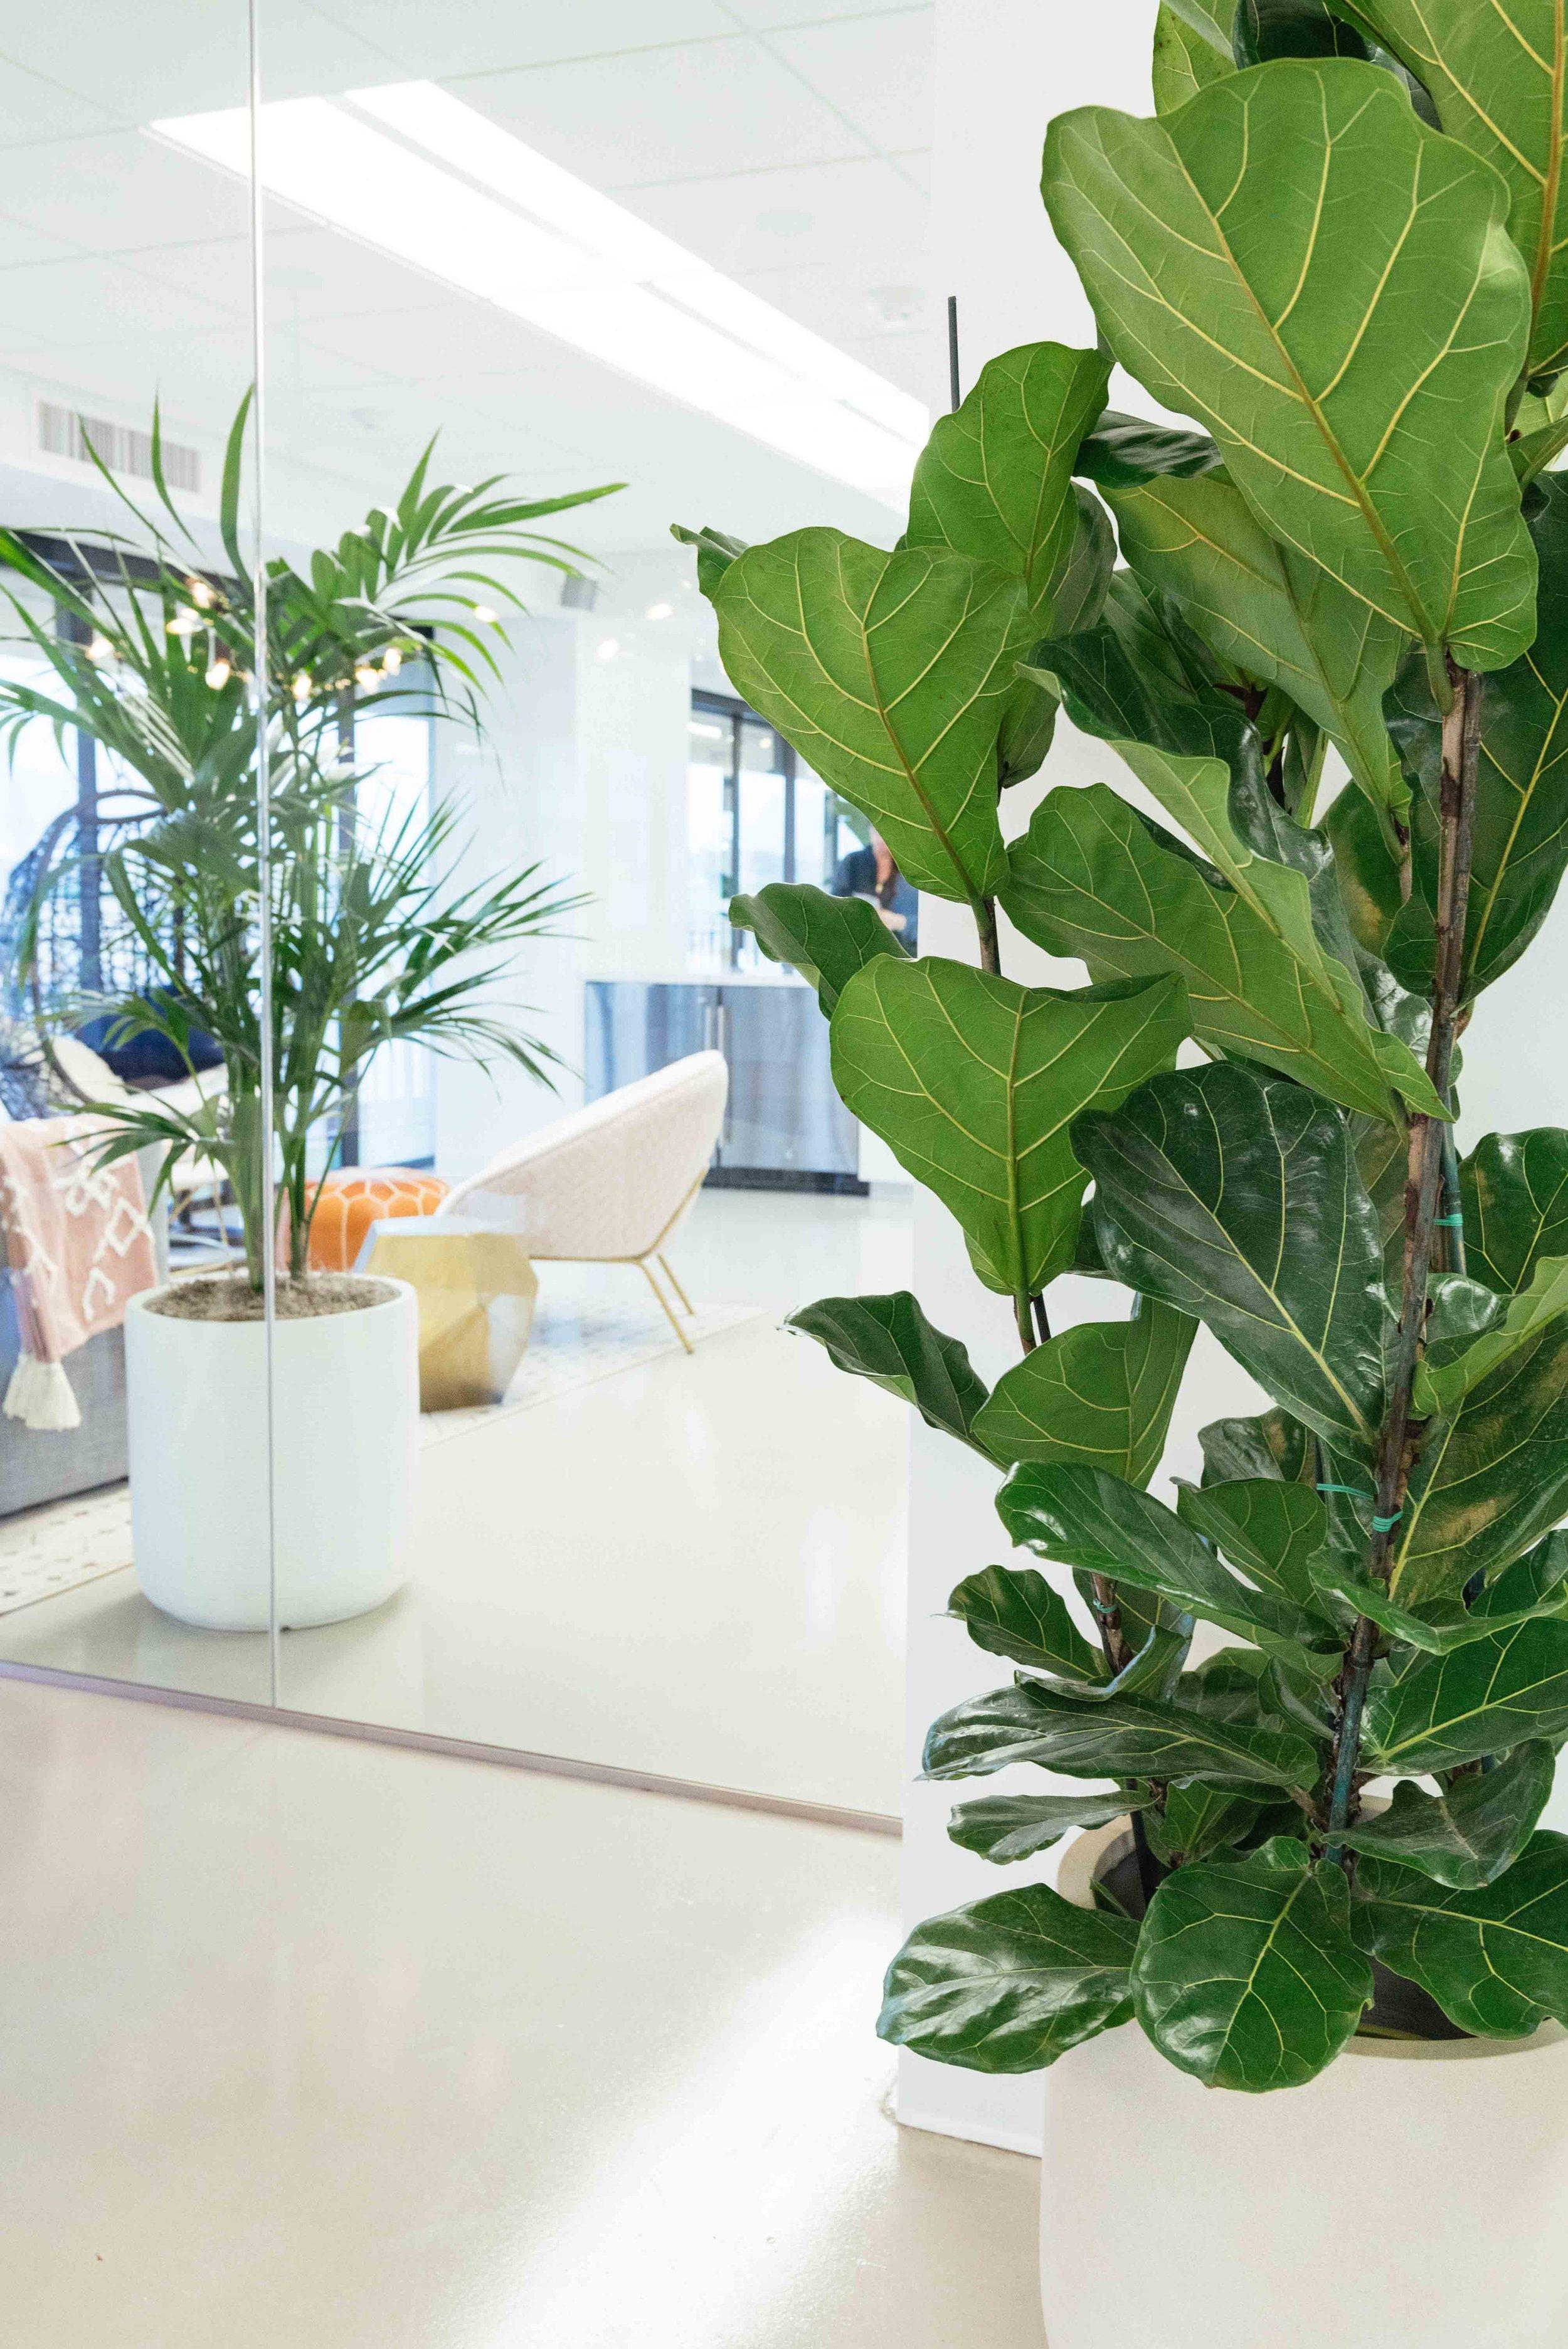 interior_plants-22.jpg